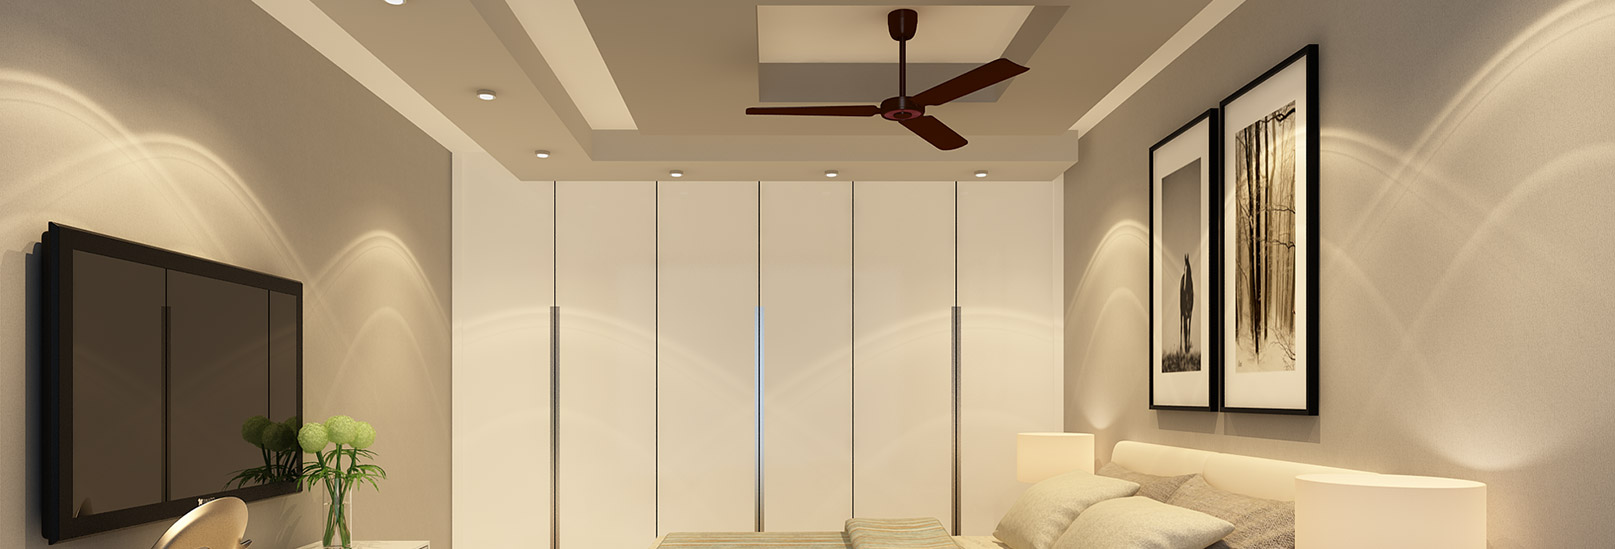 Designer Ceilings functional décor for modern day homes